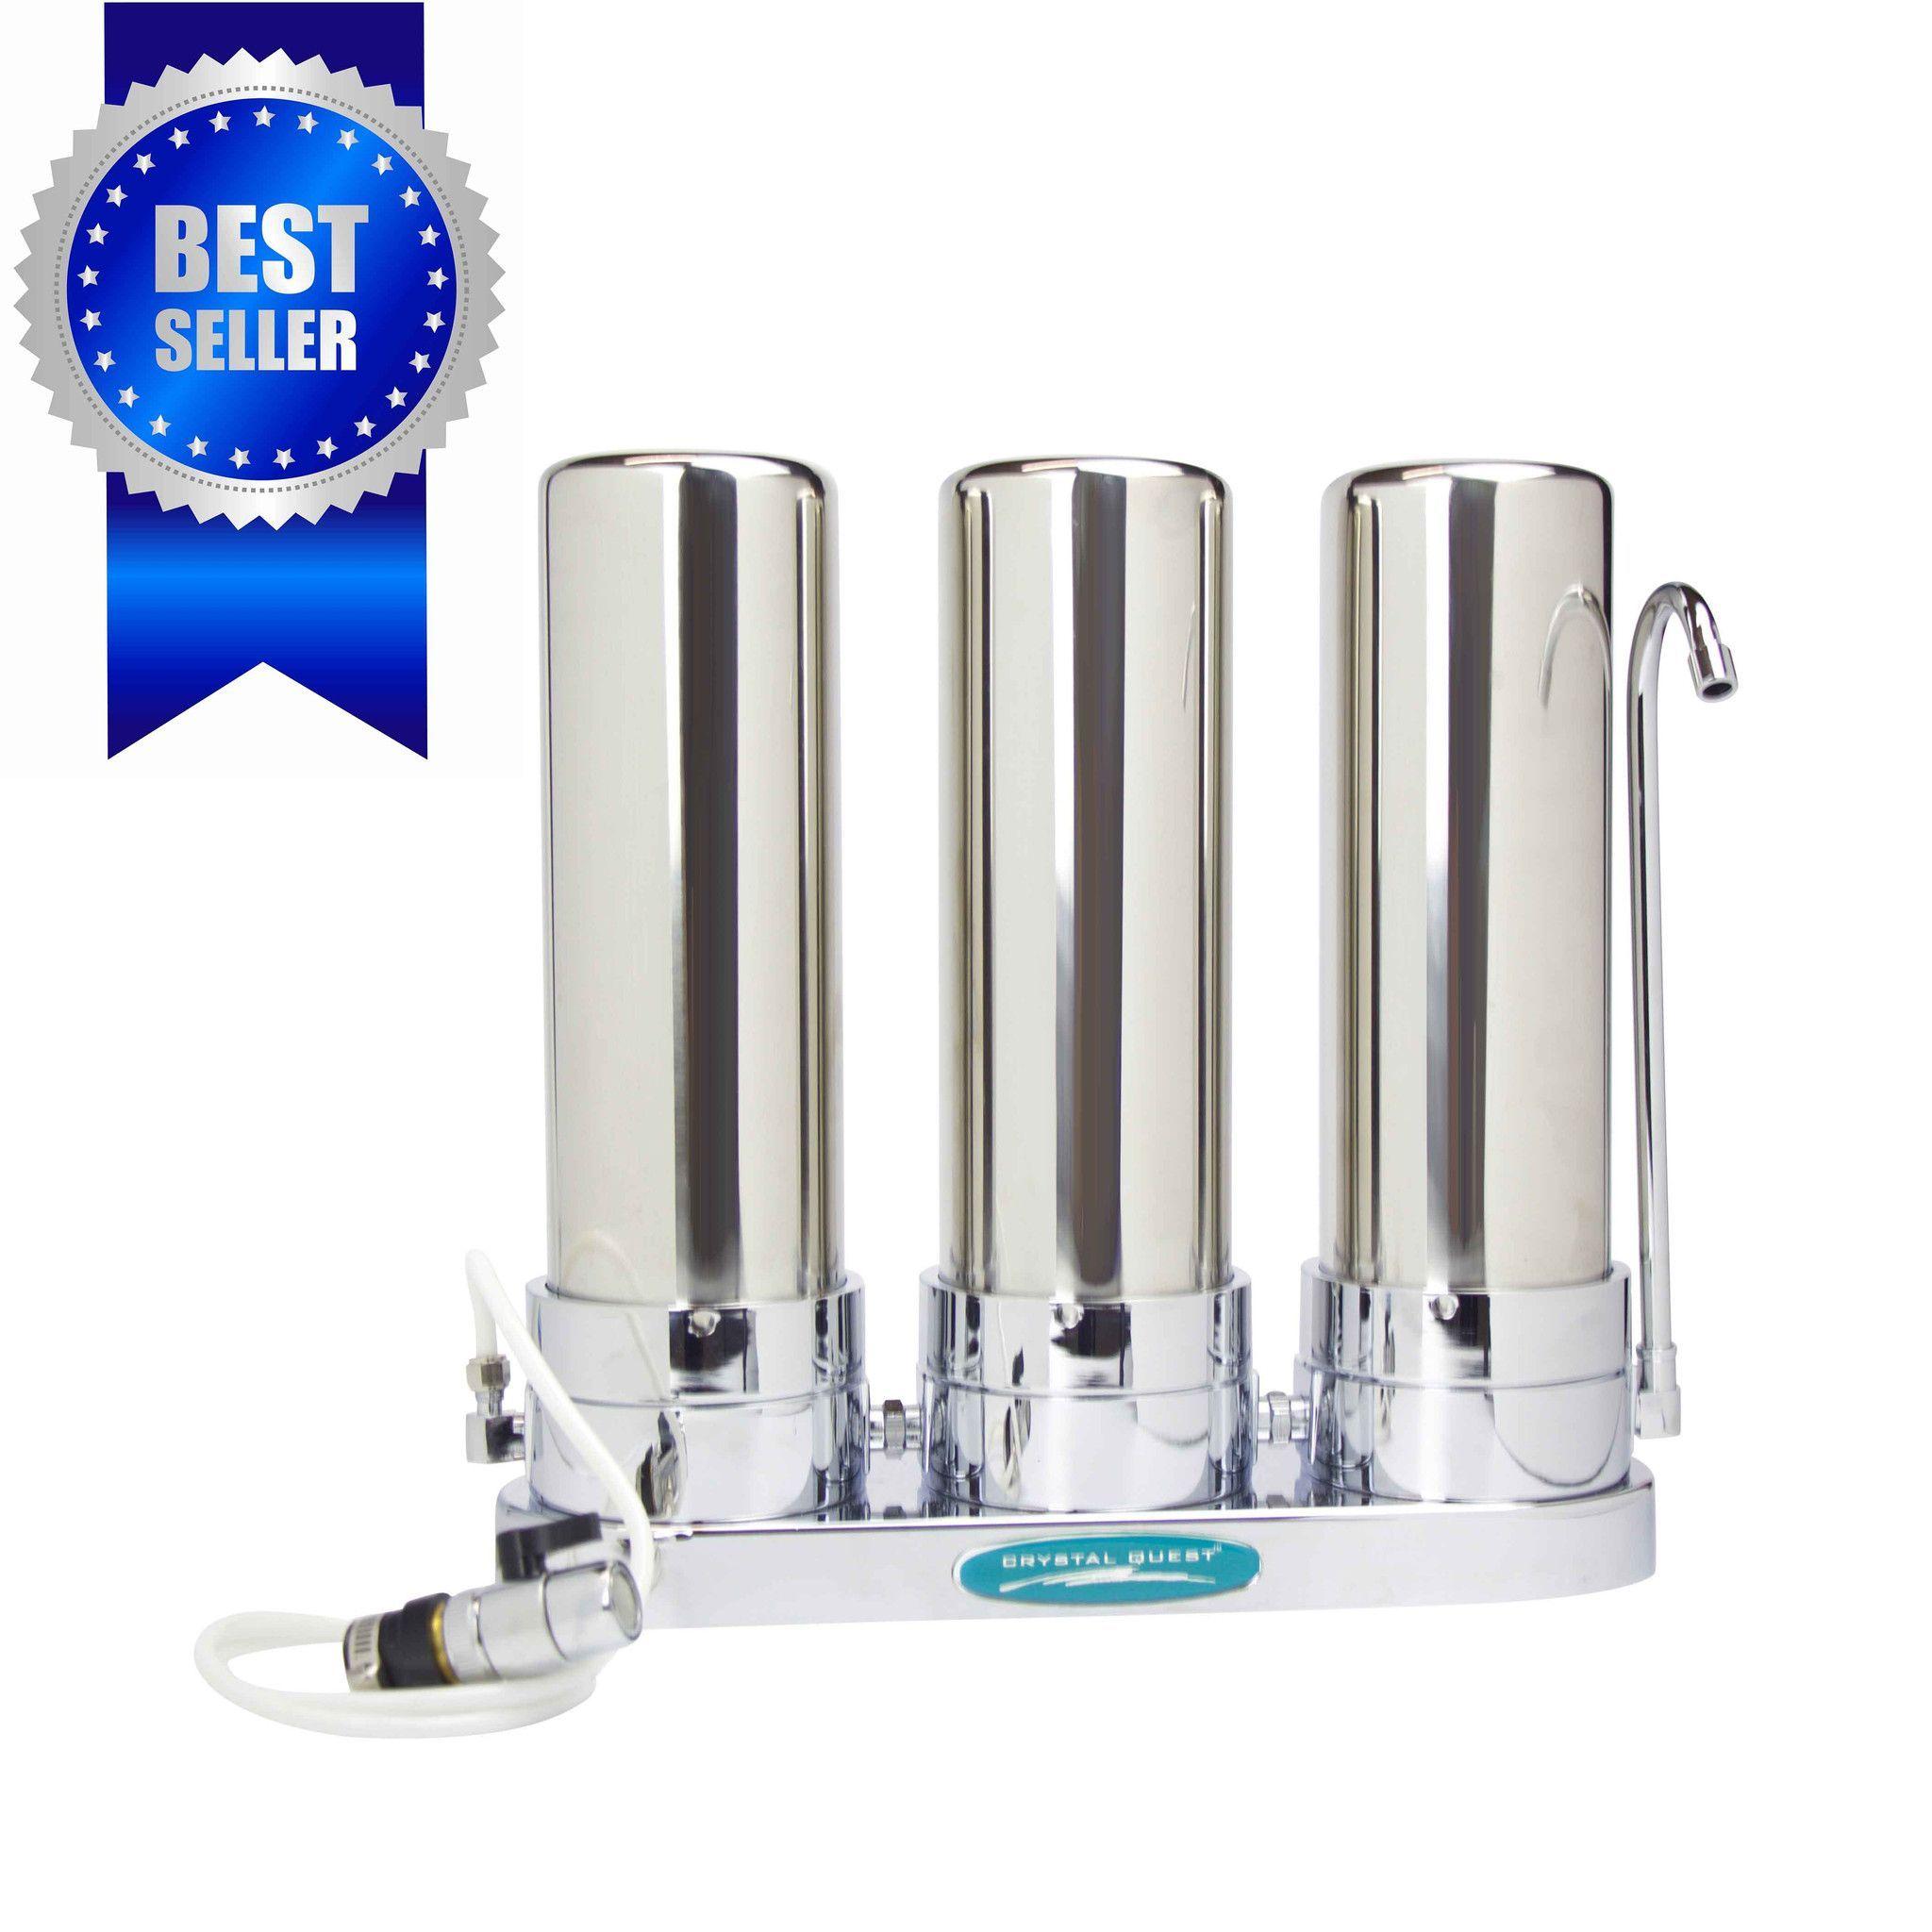 Triple Cartridge Countertop Water Filter System Countertop Water